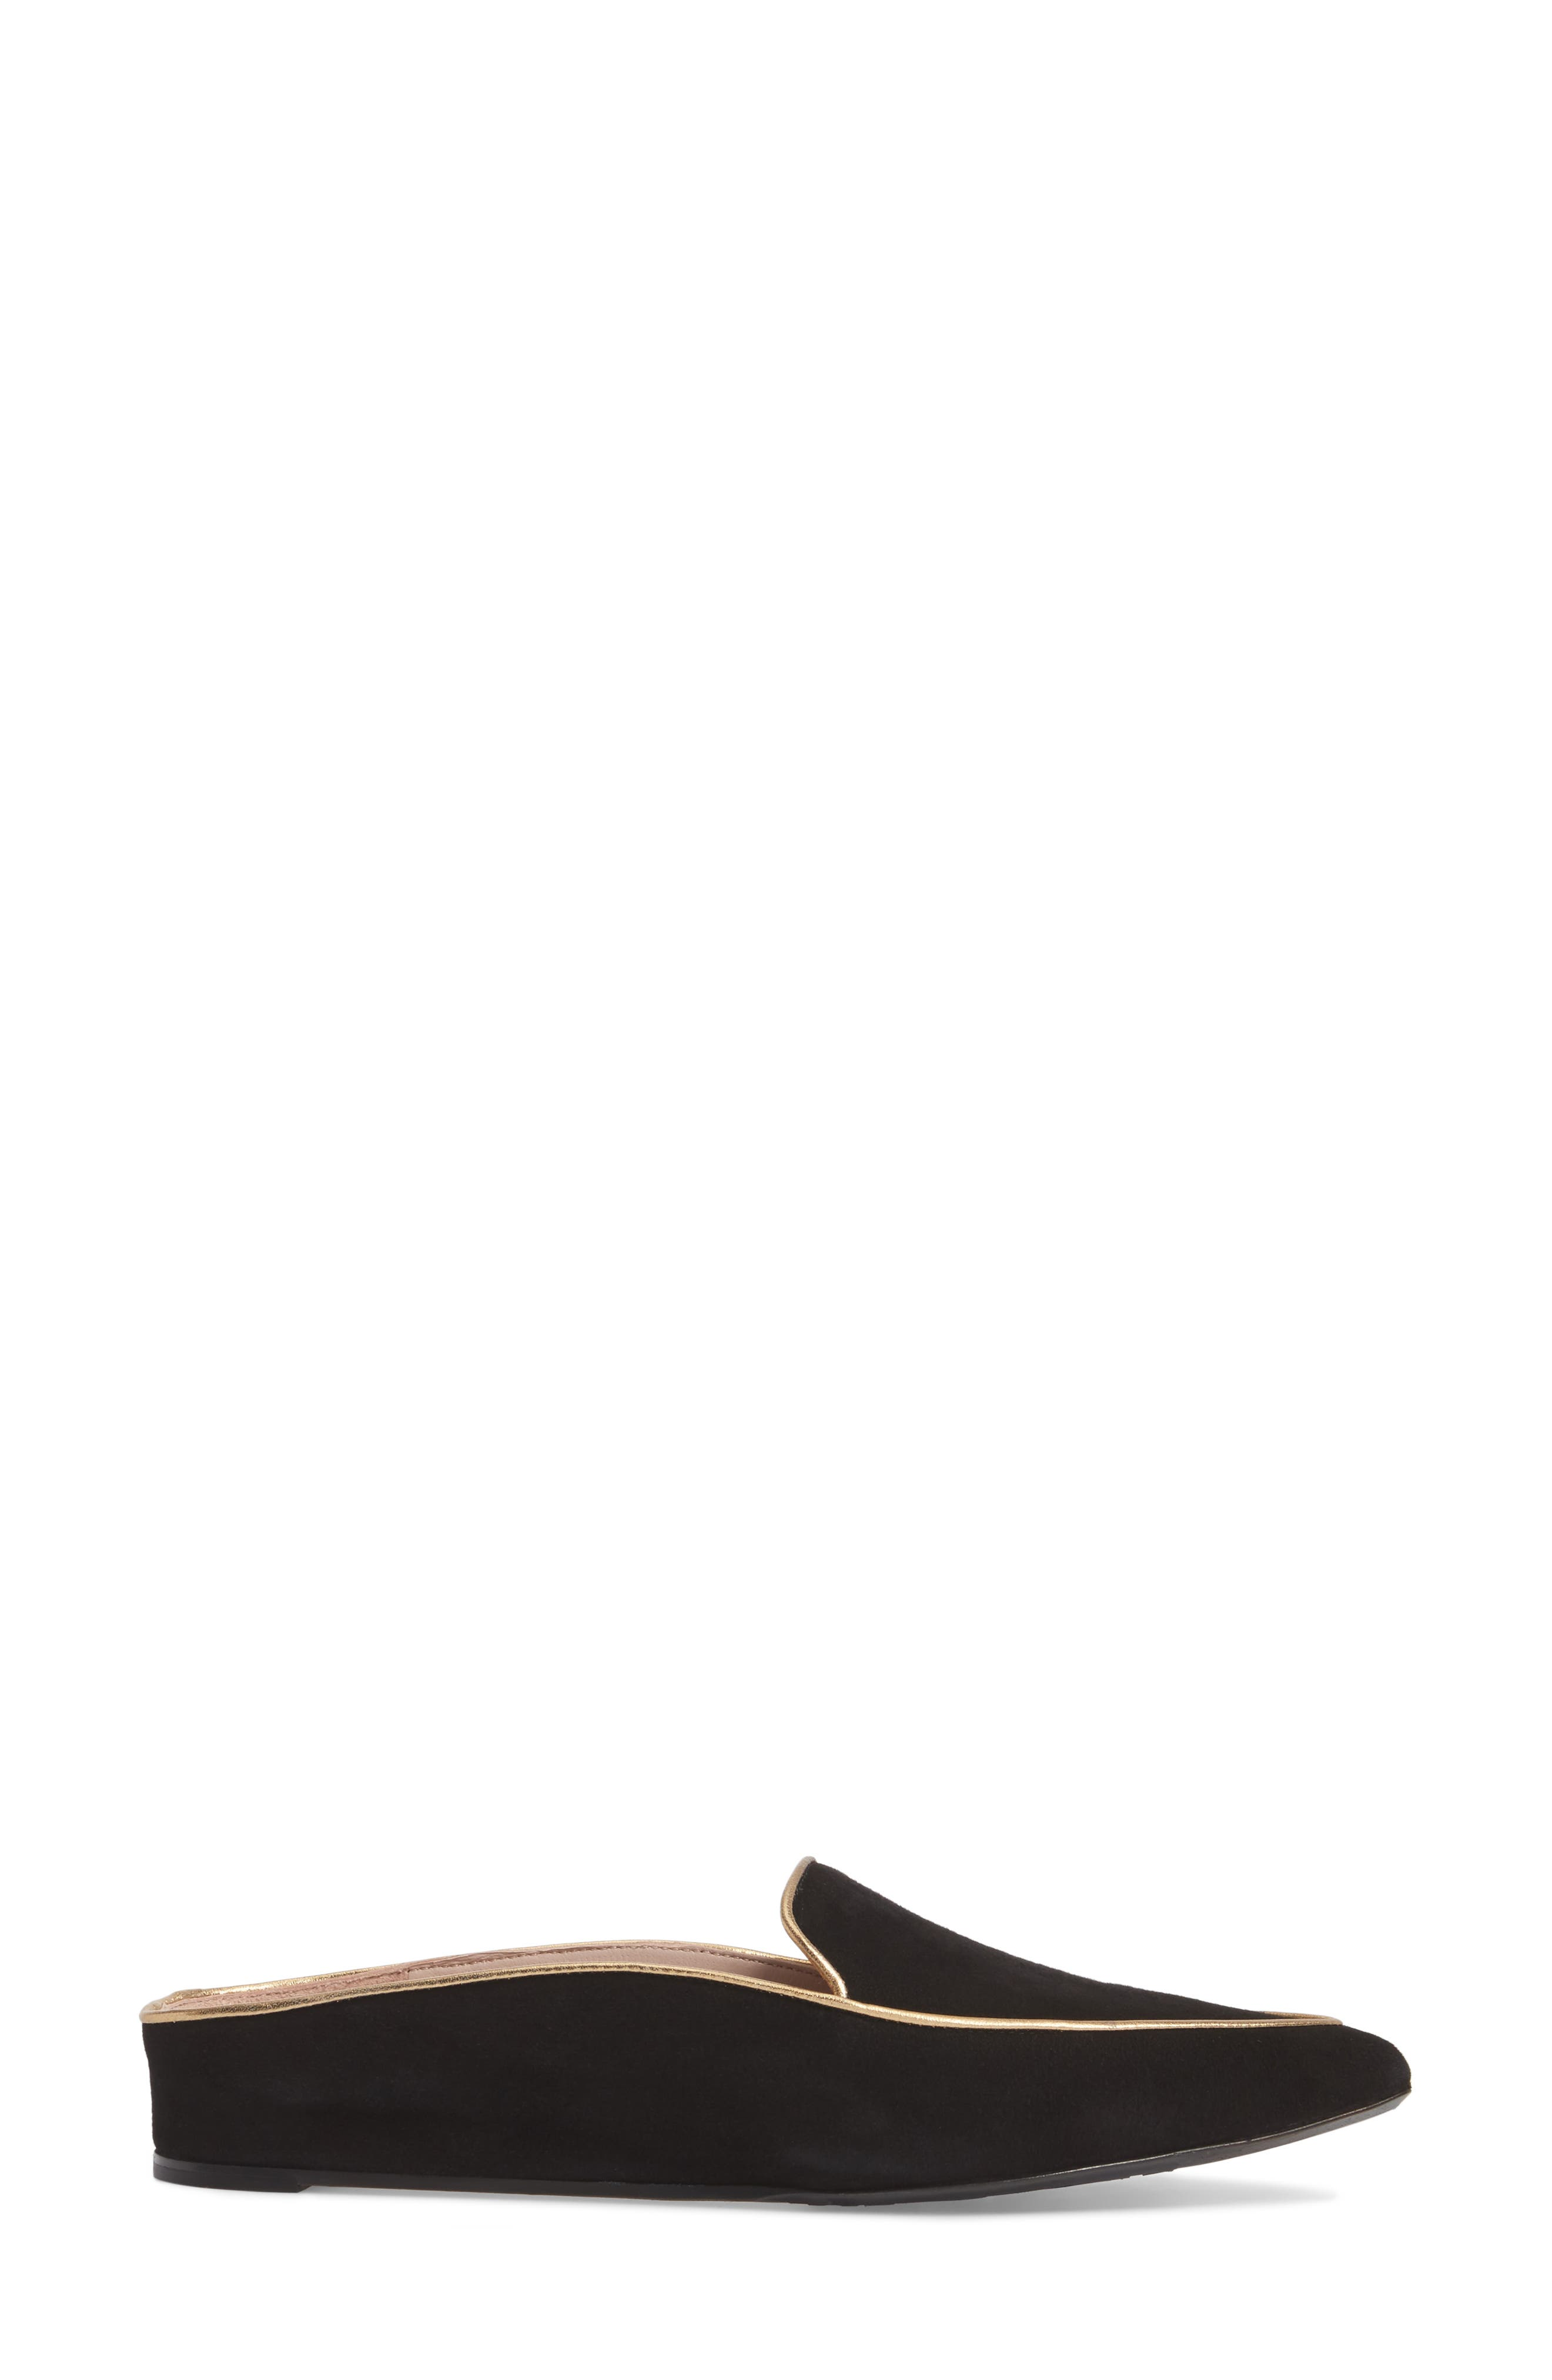 Taryn Rose Renatta Mule,                             Alternate thumbnail 3, color,                             Black/ Black Leather